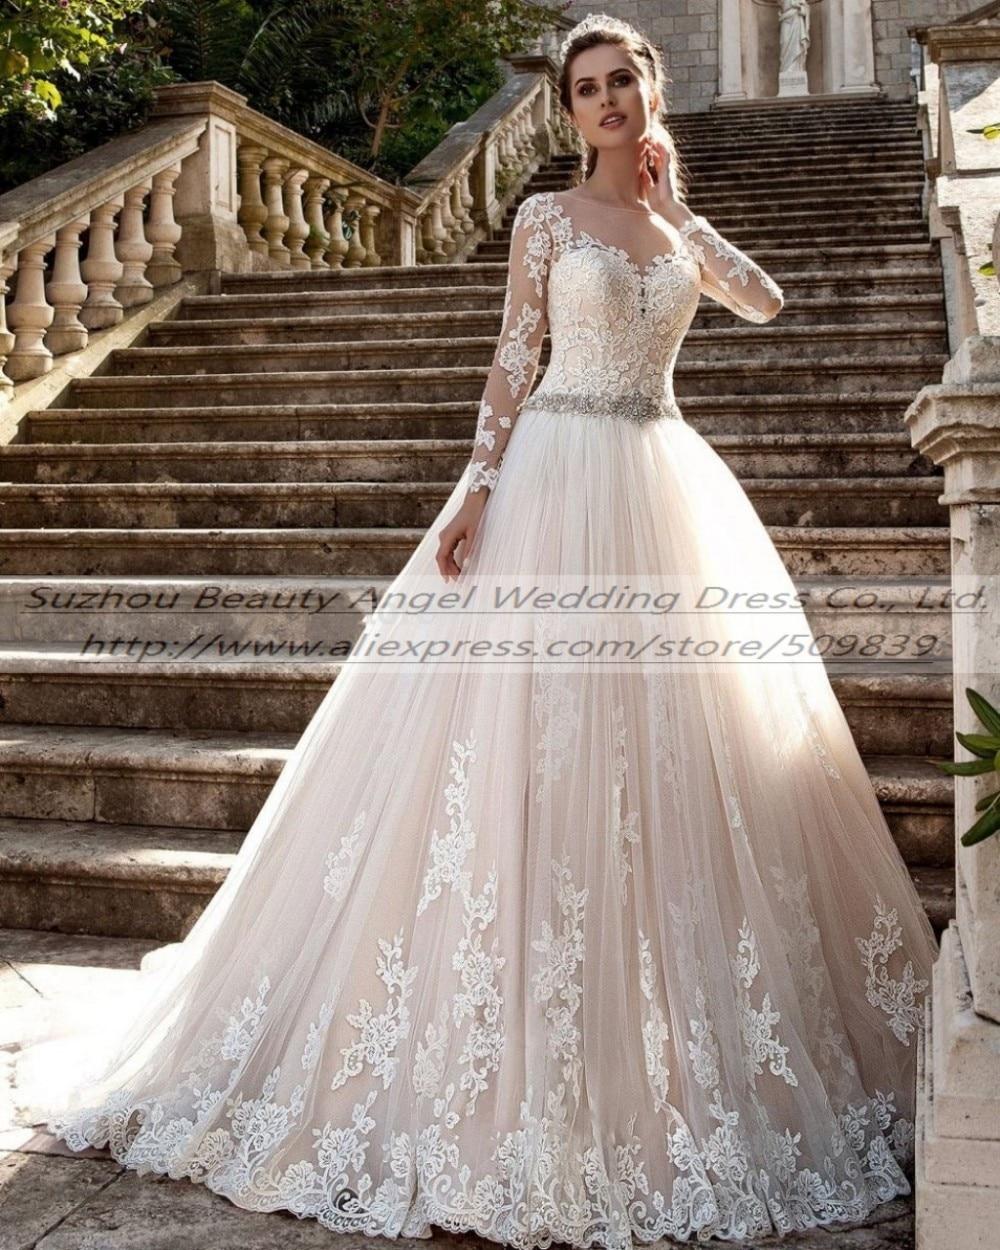 Michael Kors Wedding Dresses - Wedding Dresses In Jax